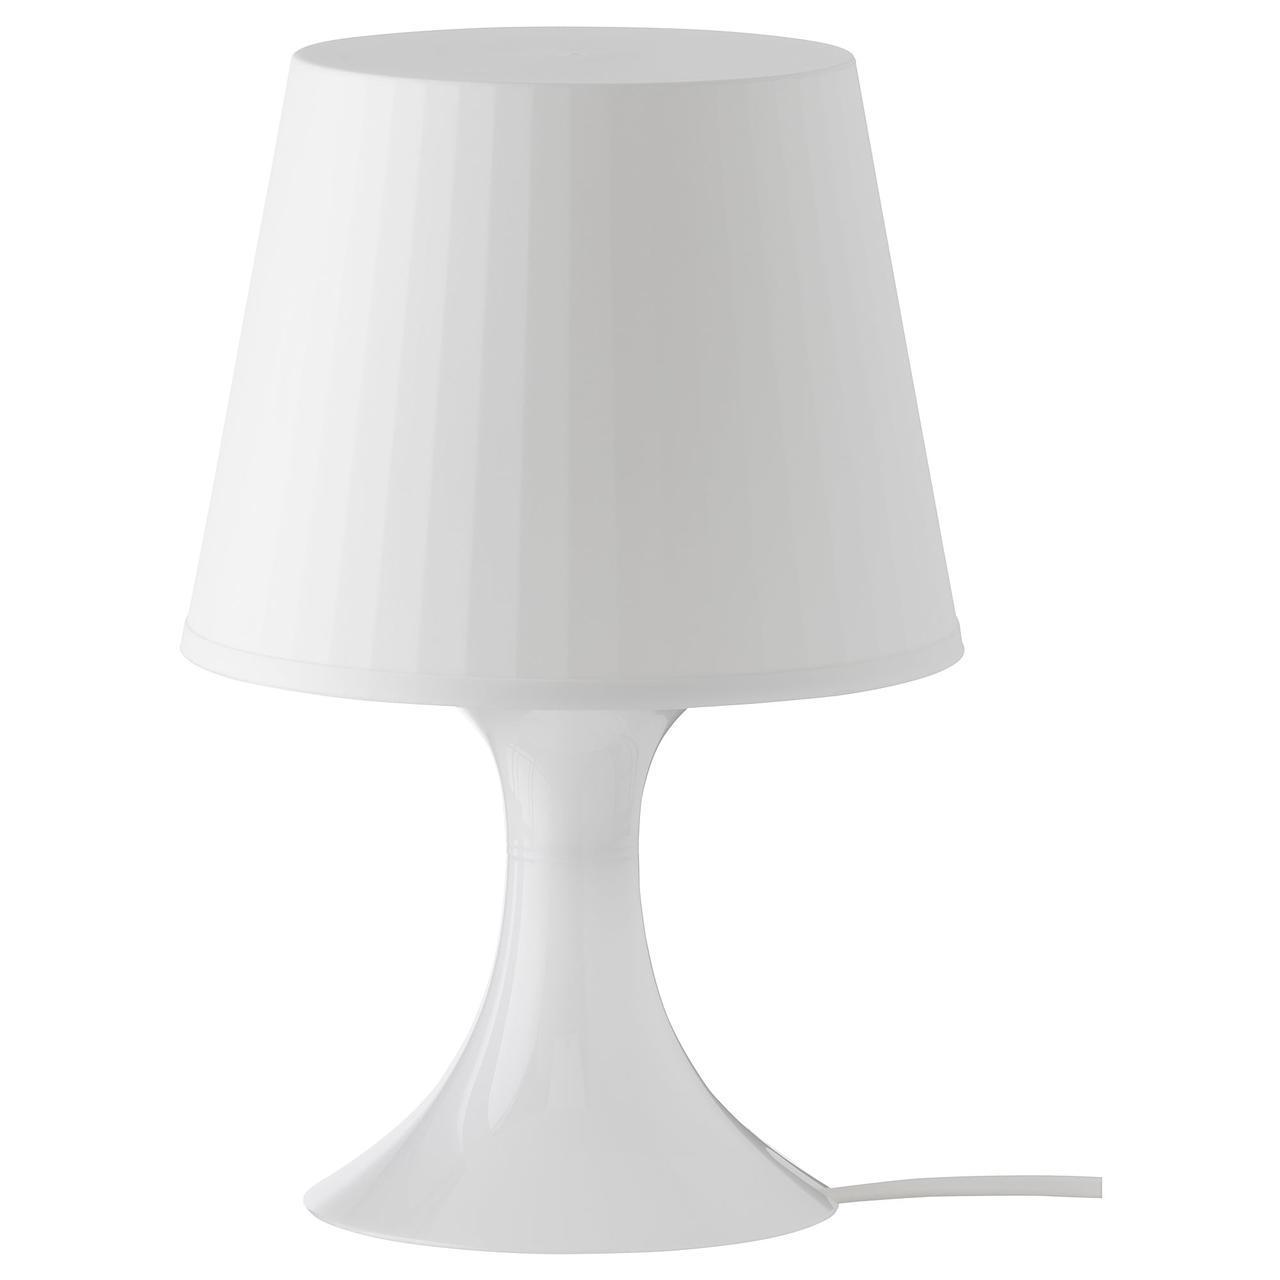 IKEA LAMPAN (200.469.88) Настольная лампа белого цвета